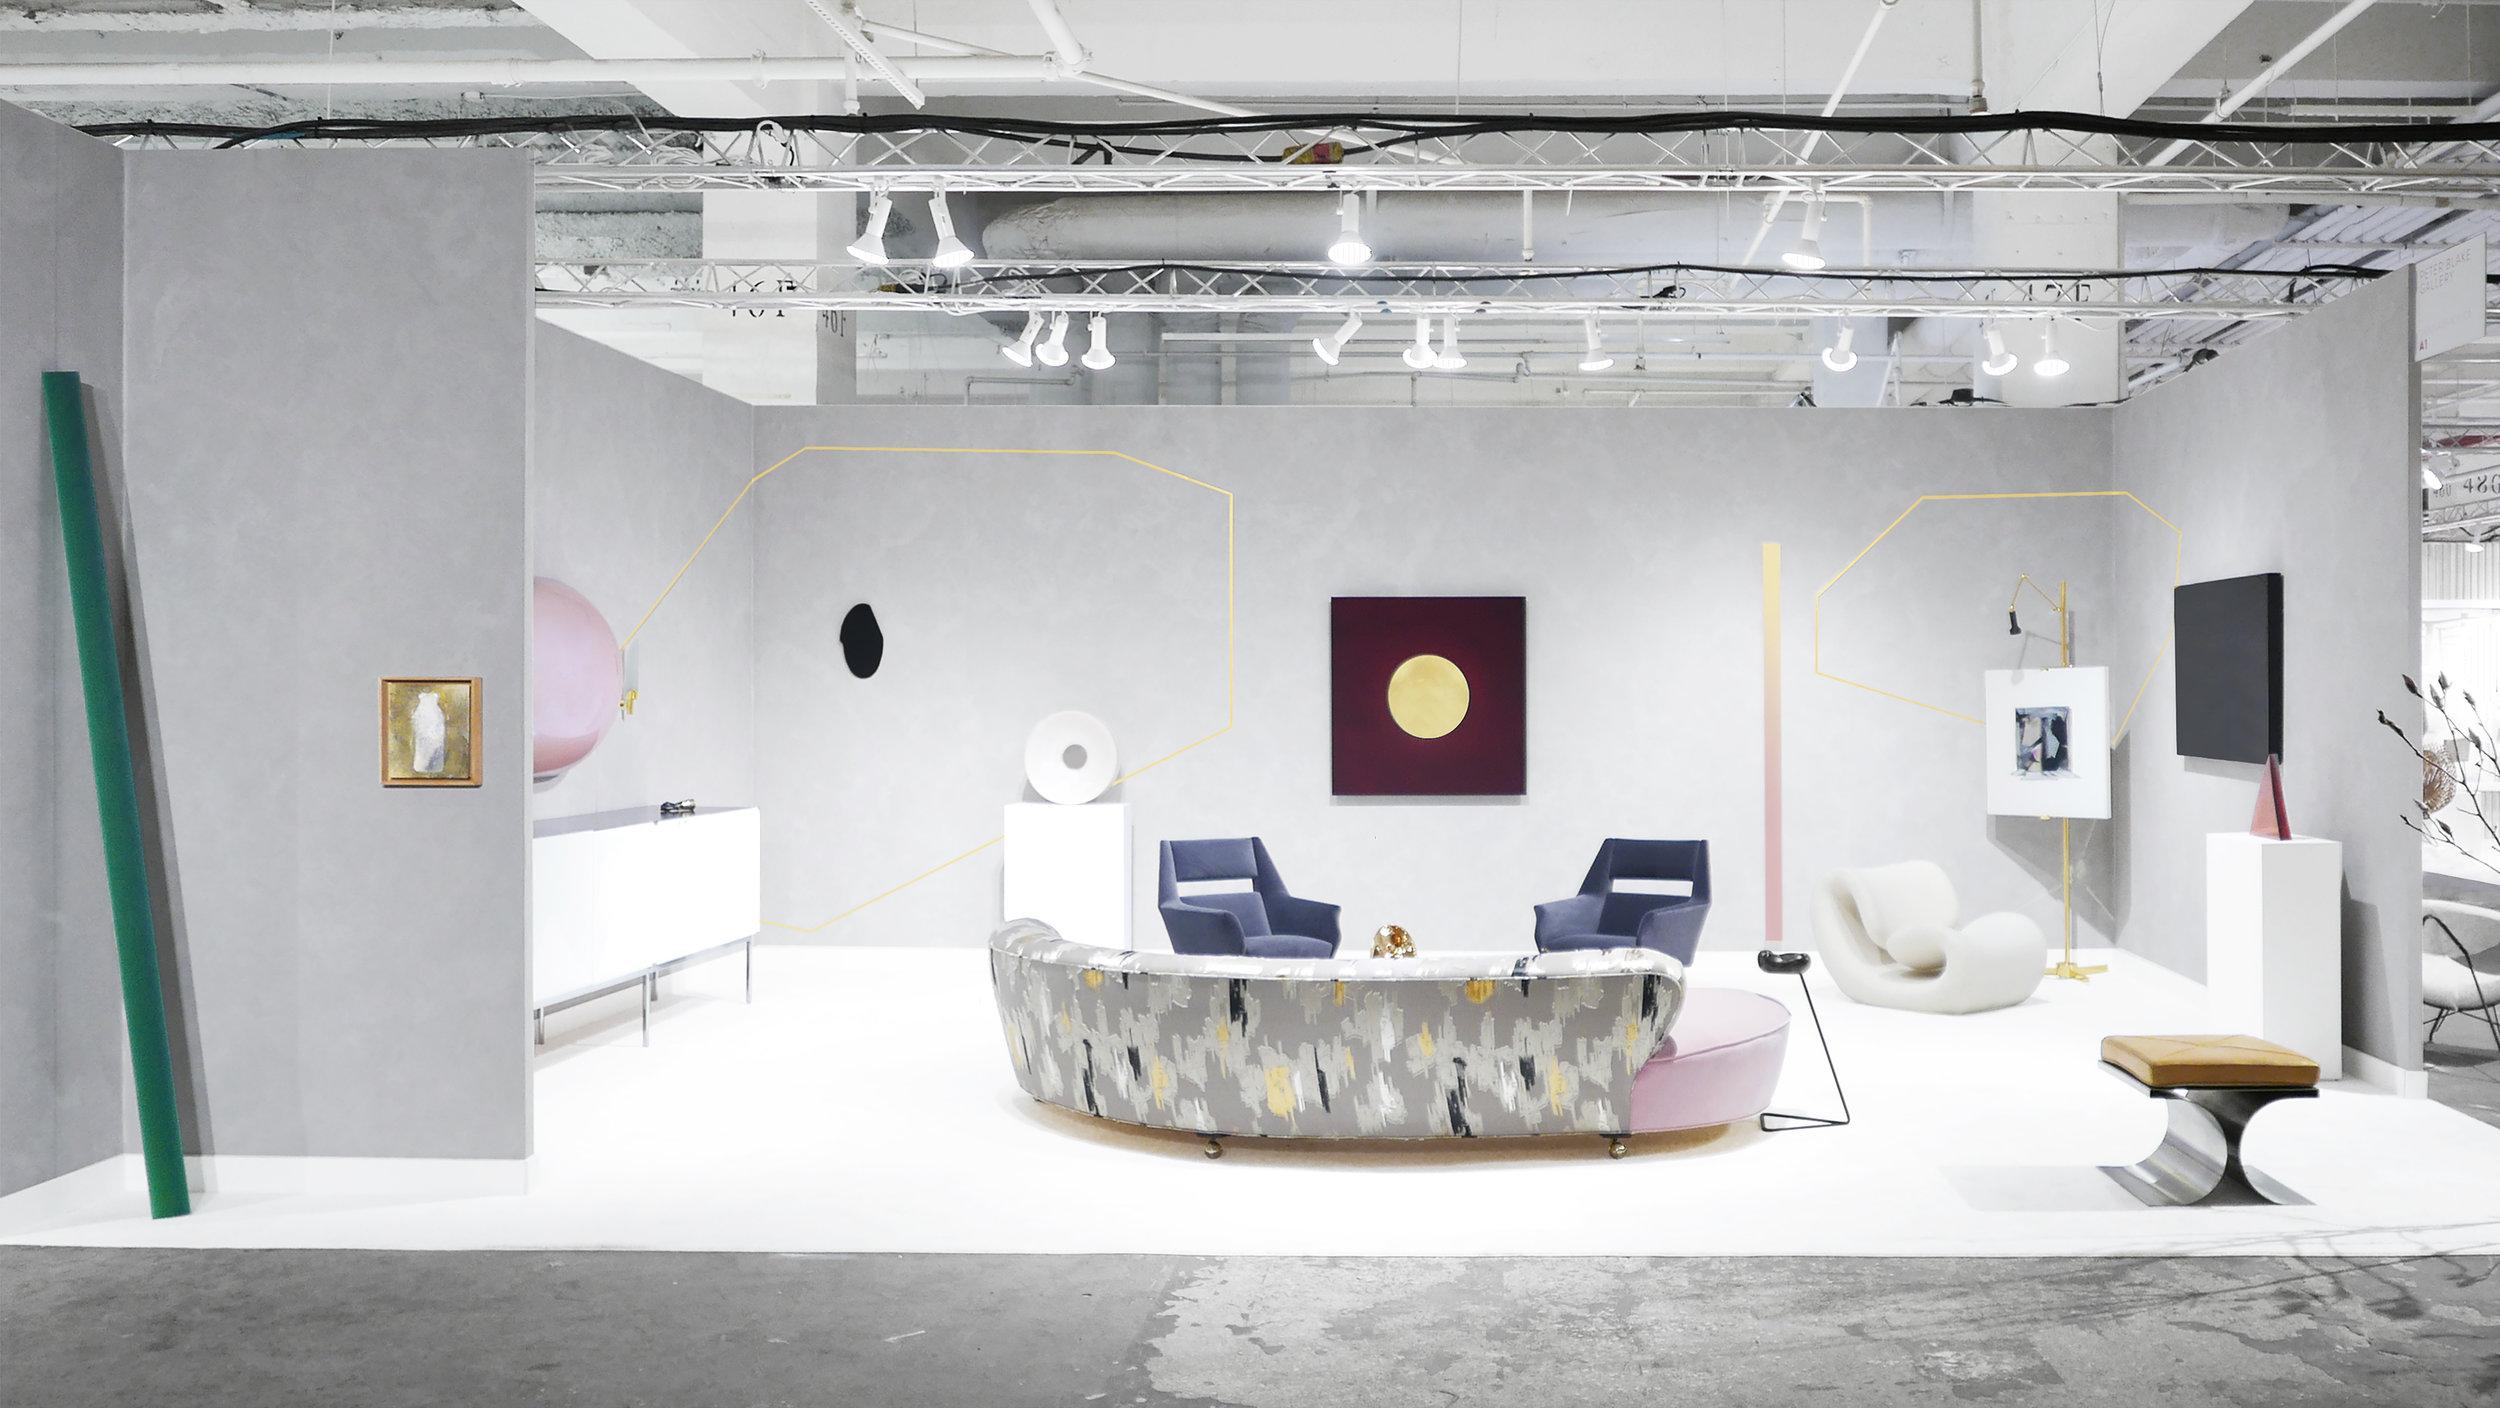 Collective Design New York 2018_Peter Blake Gallery_Installation View_1.jpg